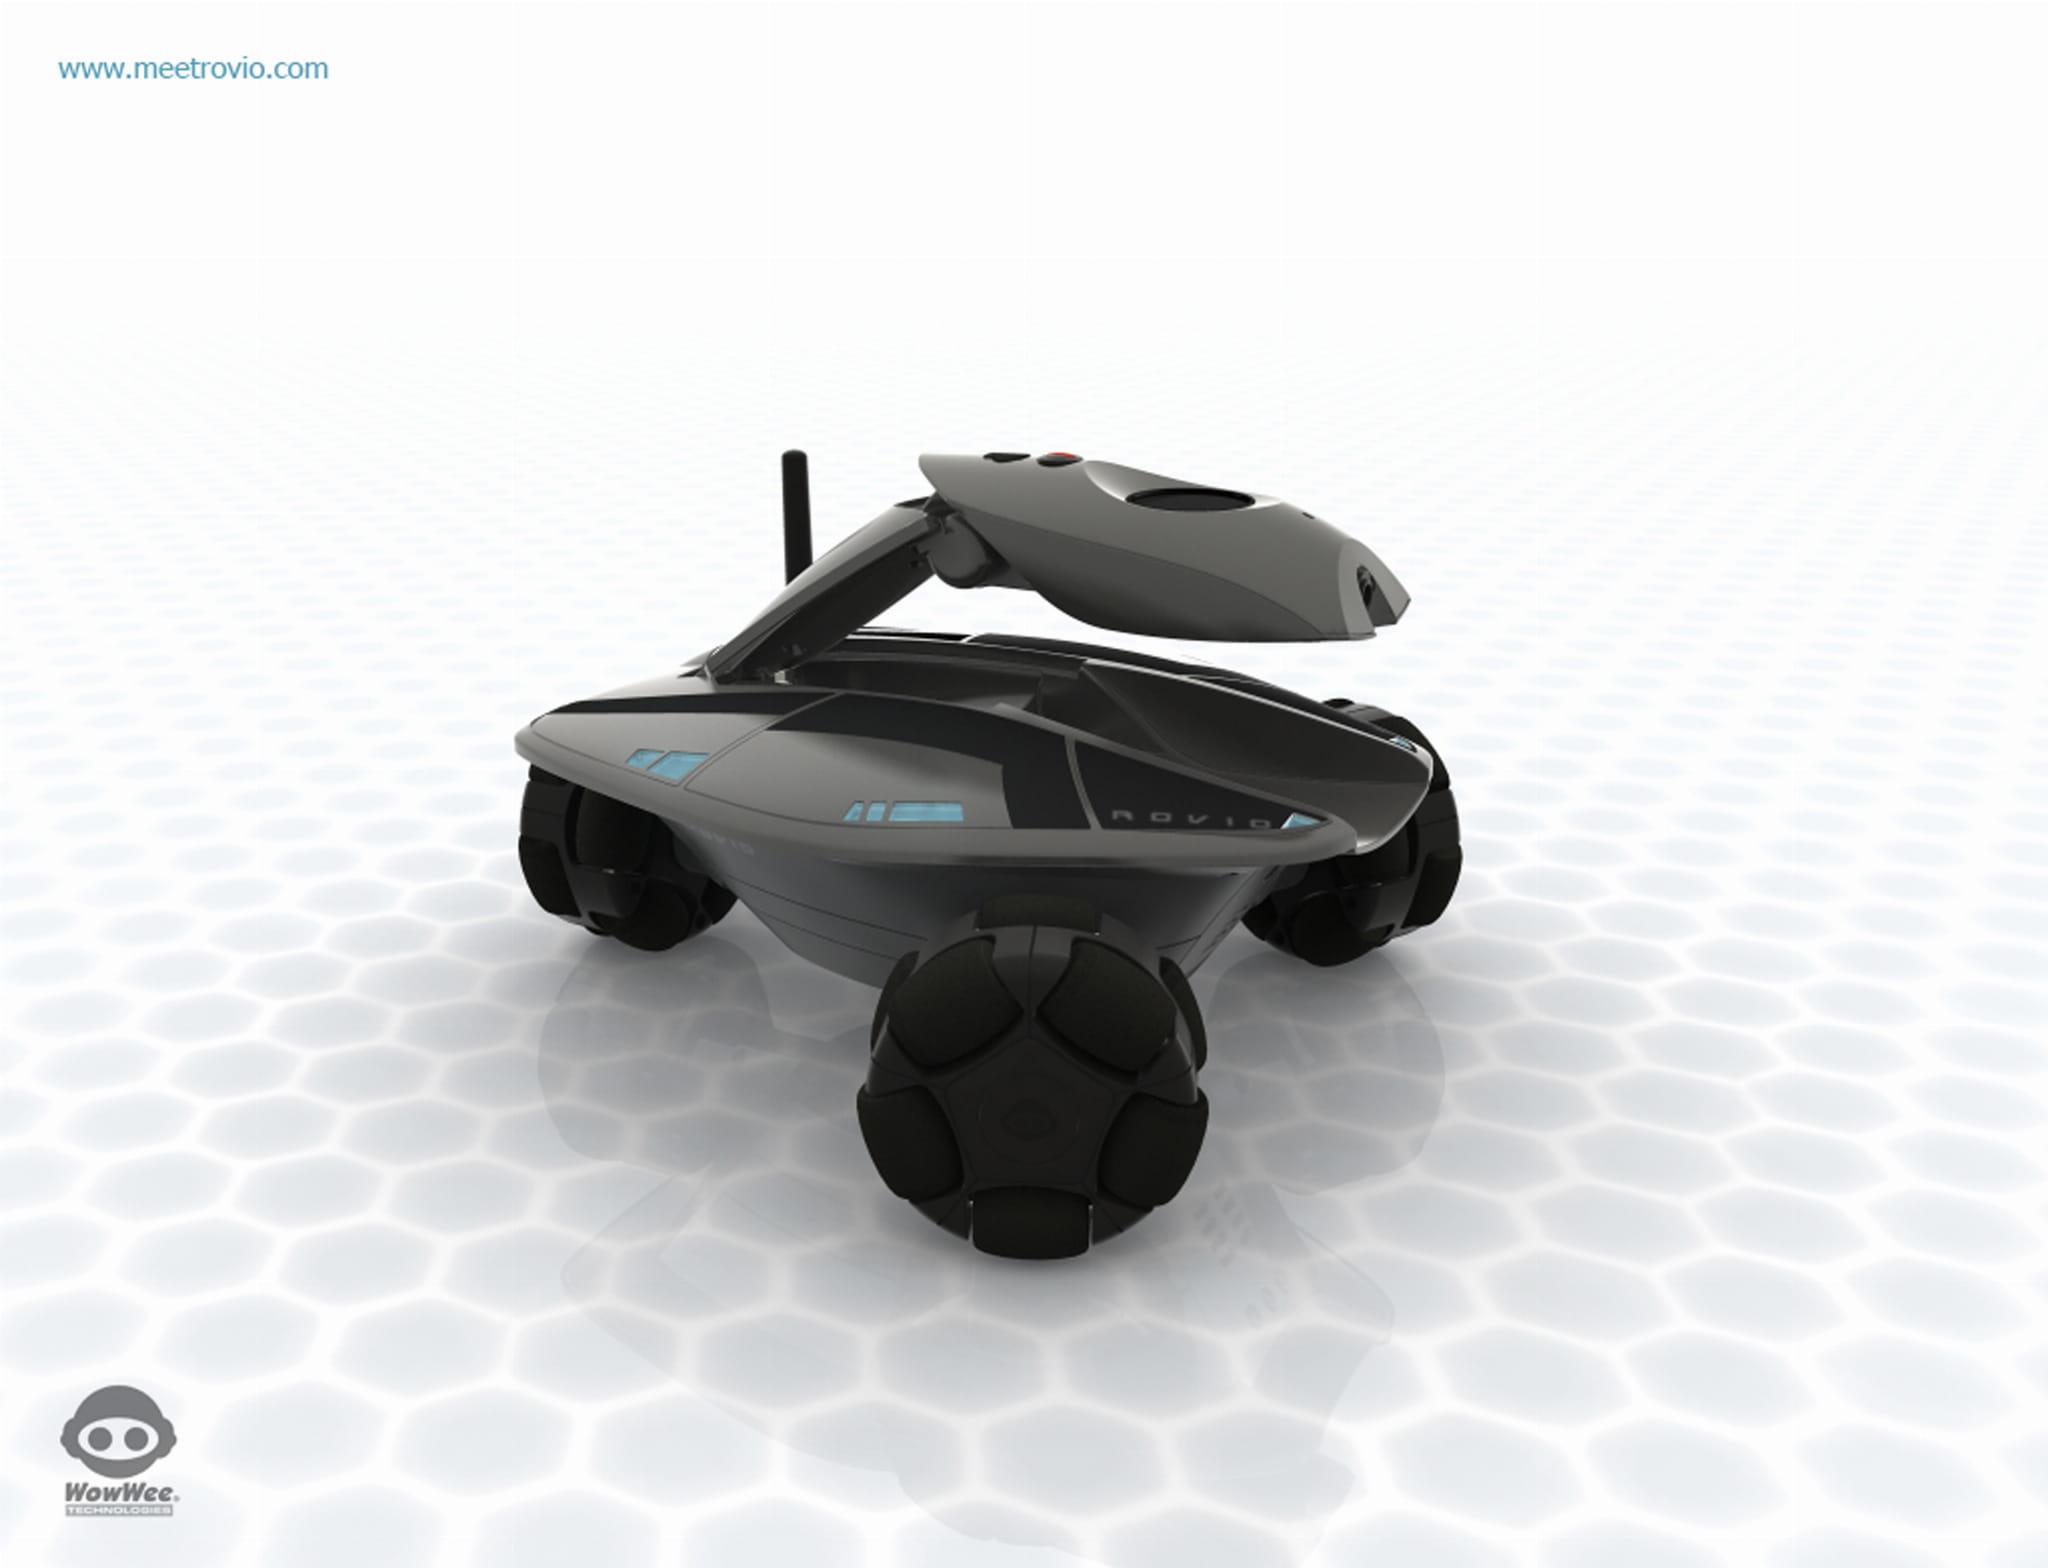 wowwee rovio roboter kamera zur berwachung. Black Bedroom Furniture Sets. Home Design Ideas